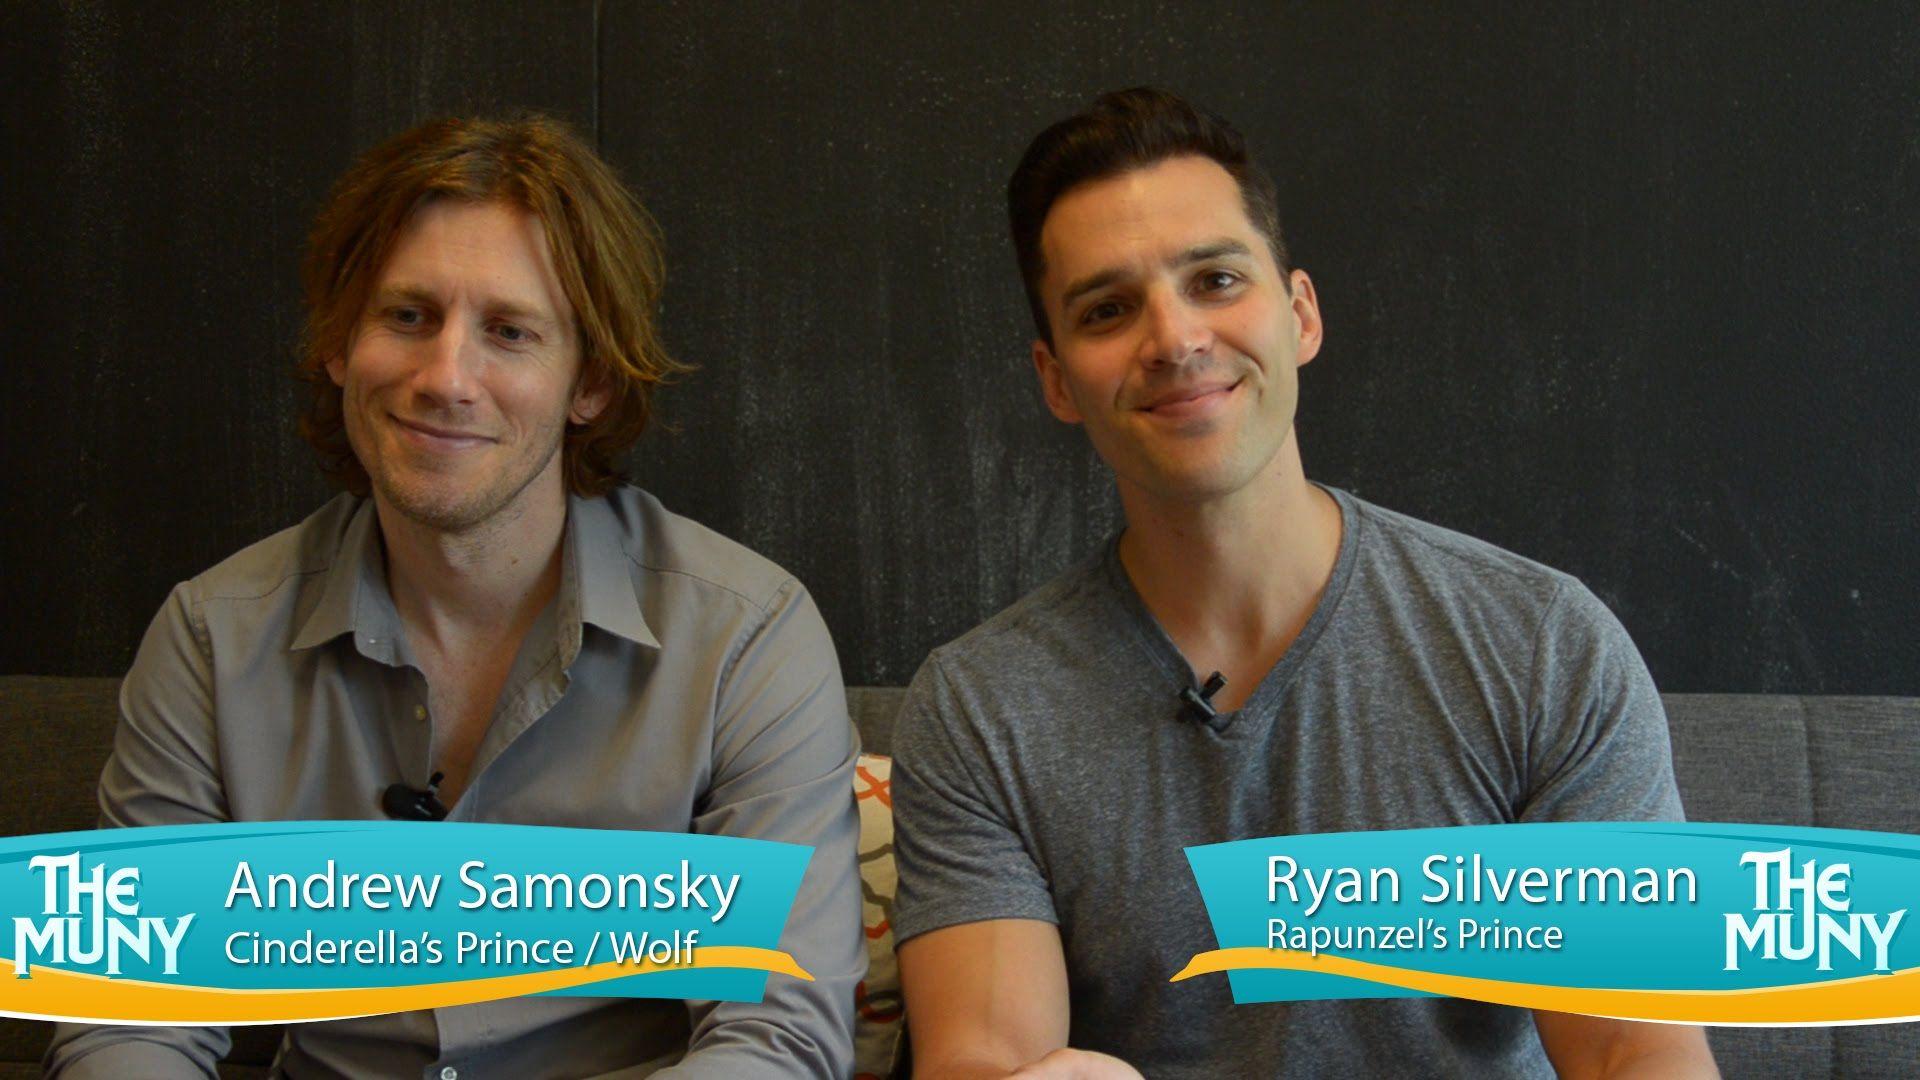 Meet Andrew Samonsky and Ryan Silverman at The Muny!